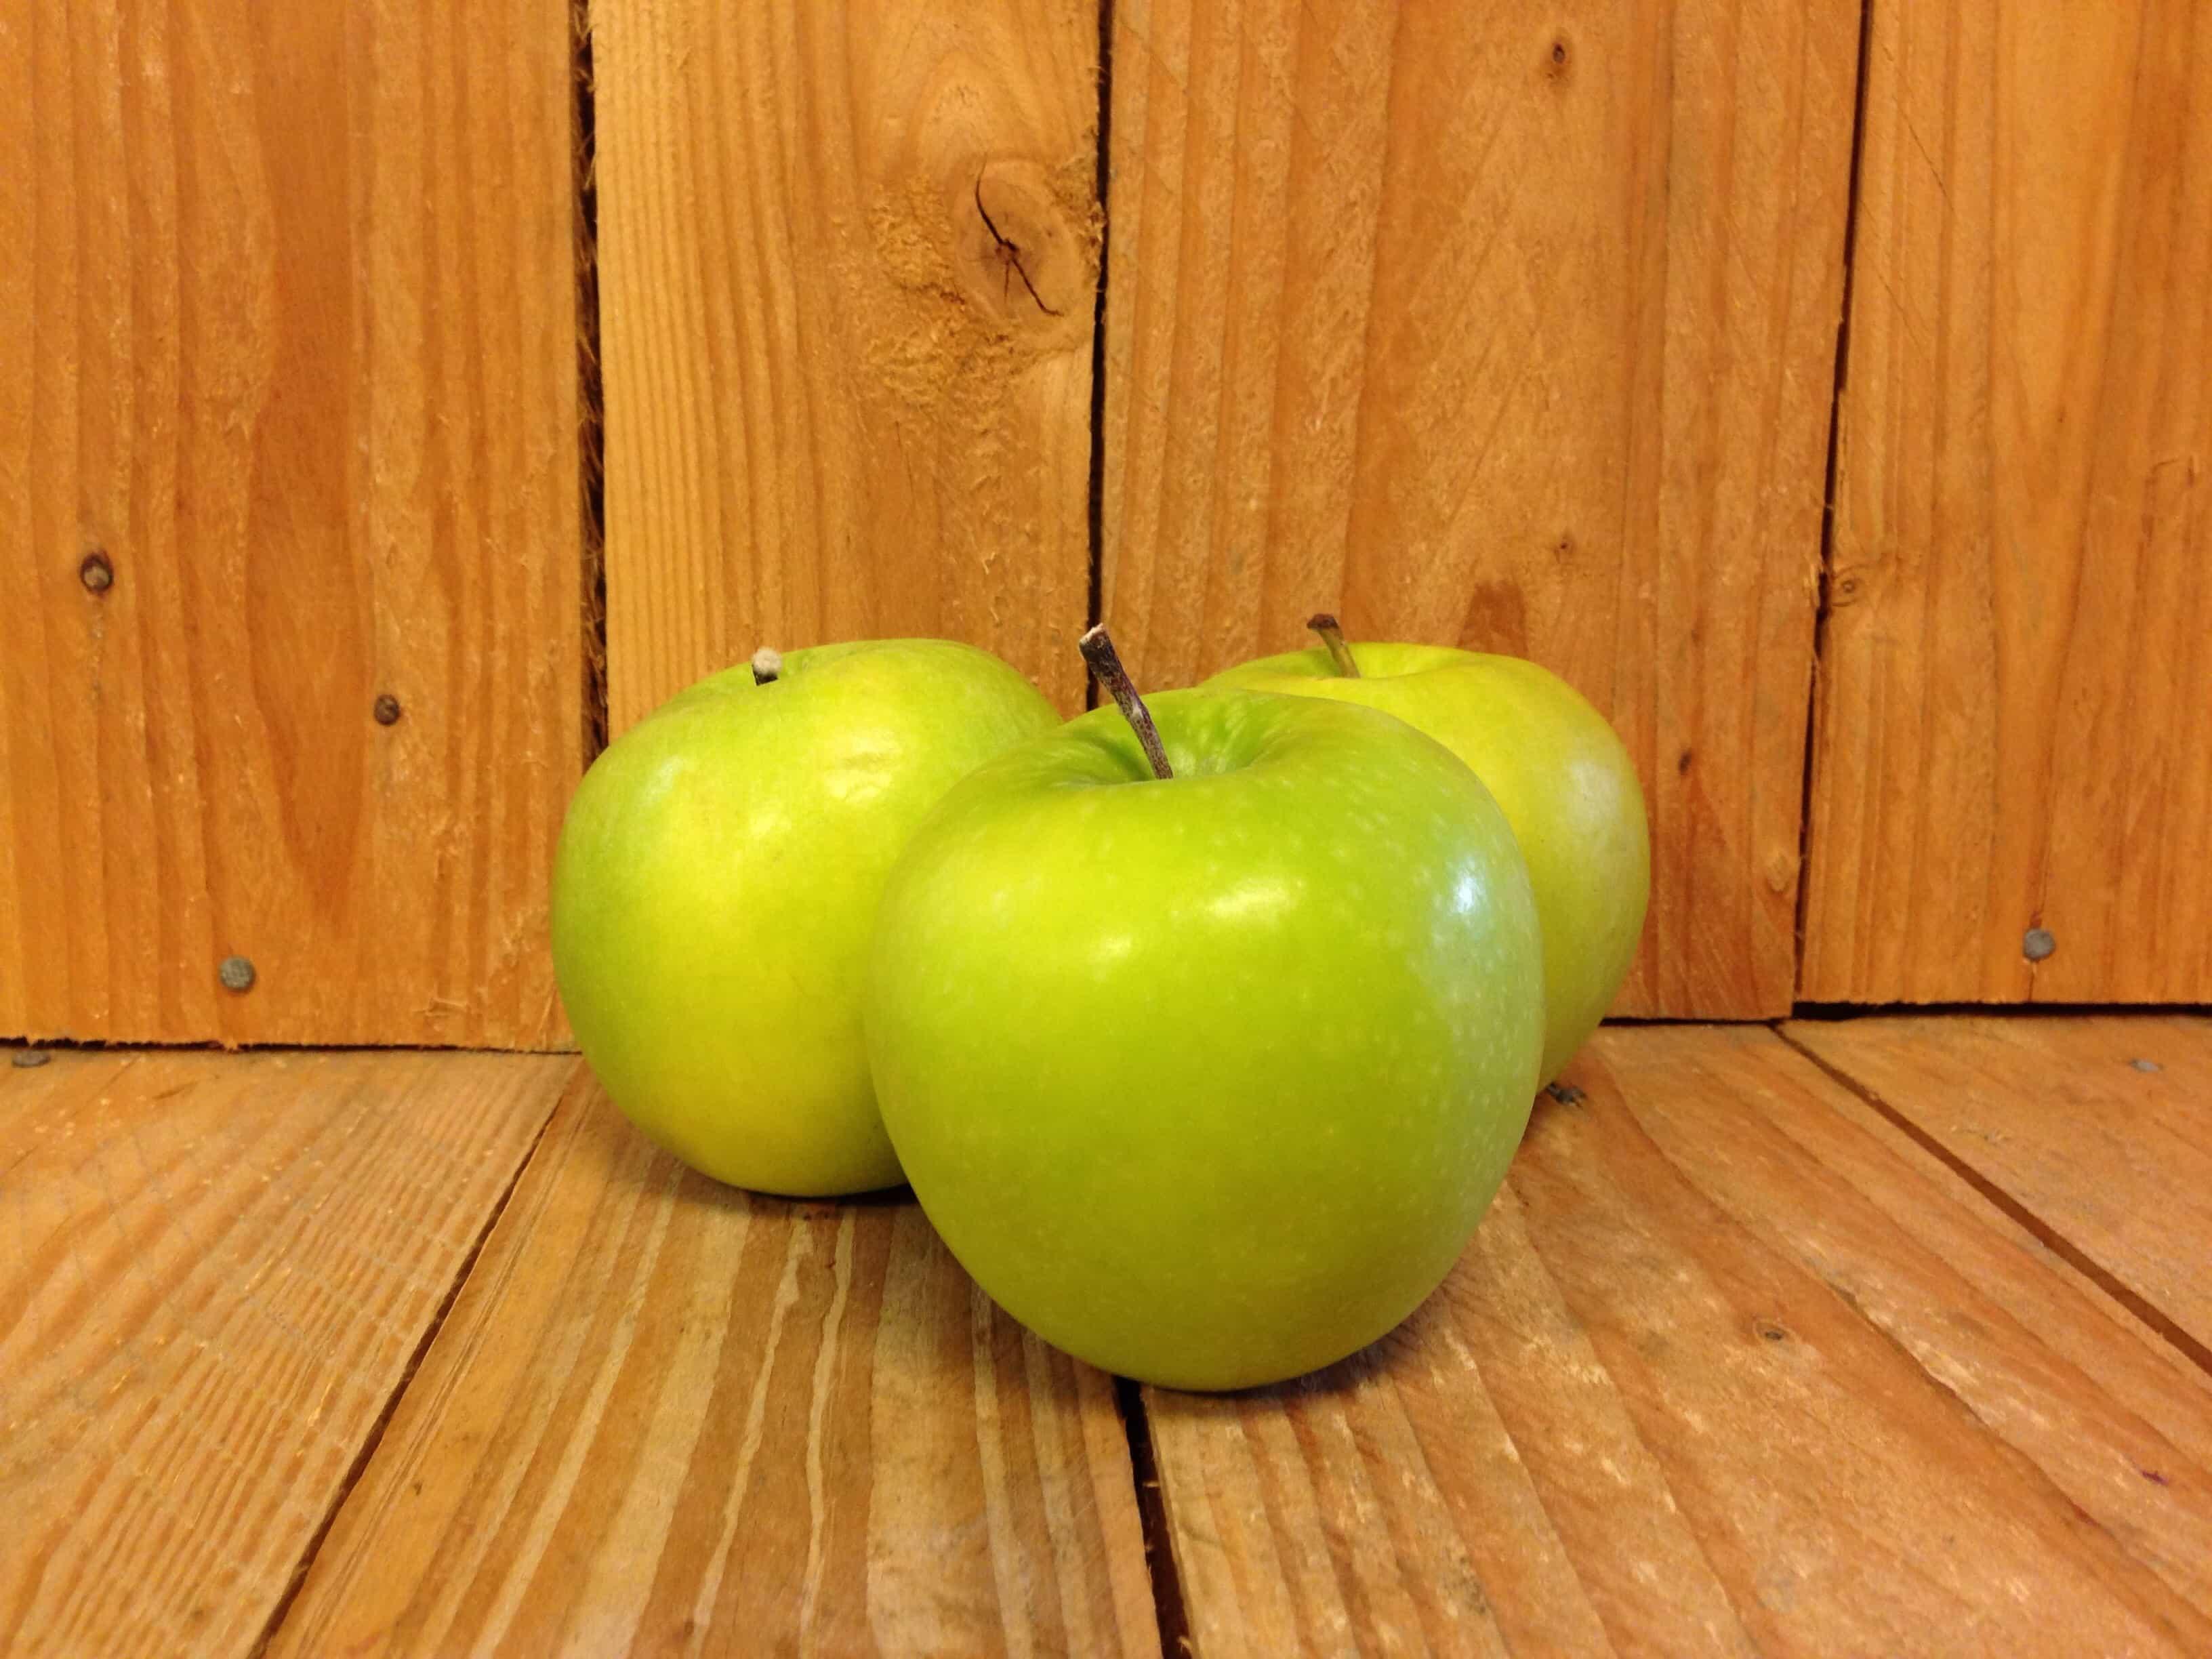 Apples – Granny Smith BC (Bag of 5)